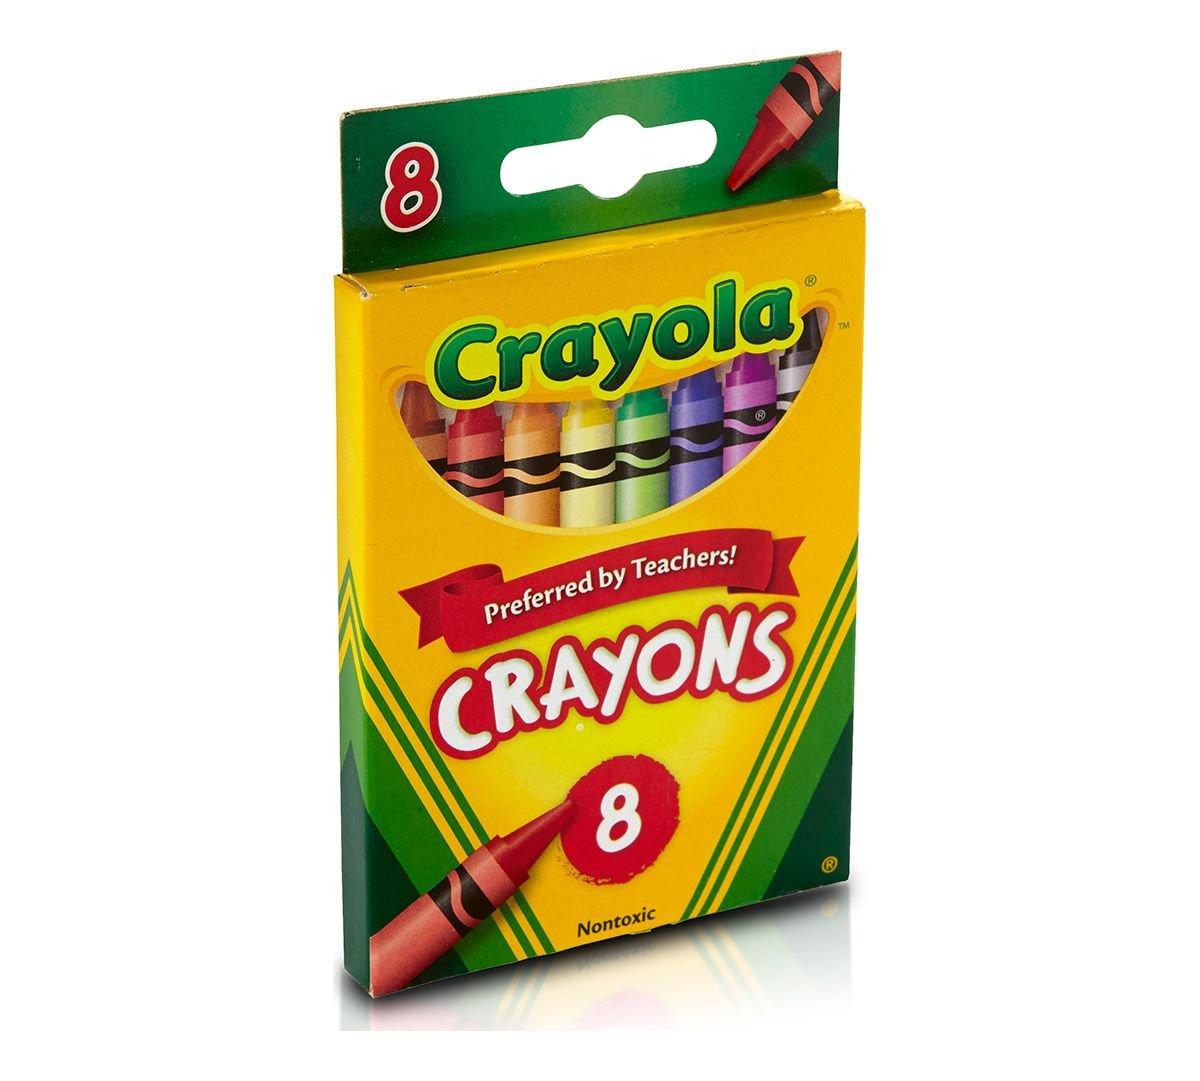 8 Count Crayola Crayons Pack of 2 Crayon Sharpener